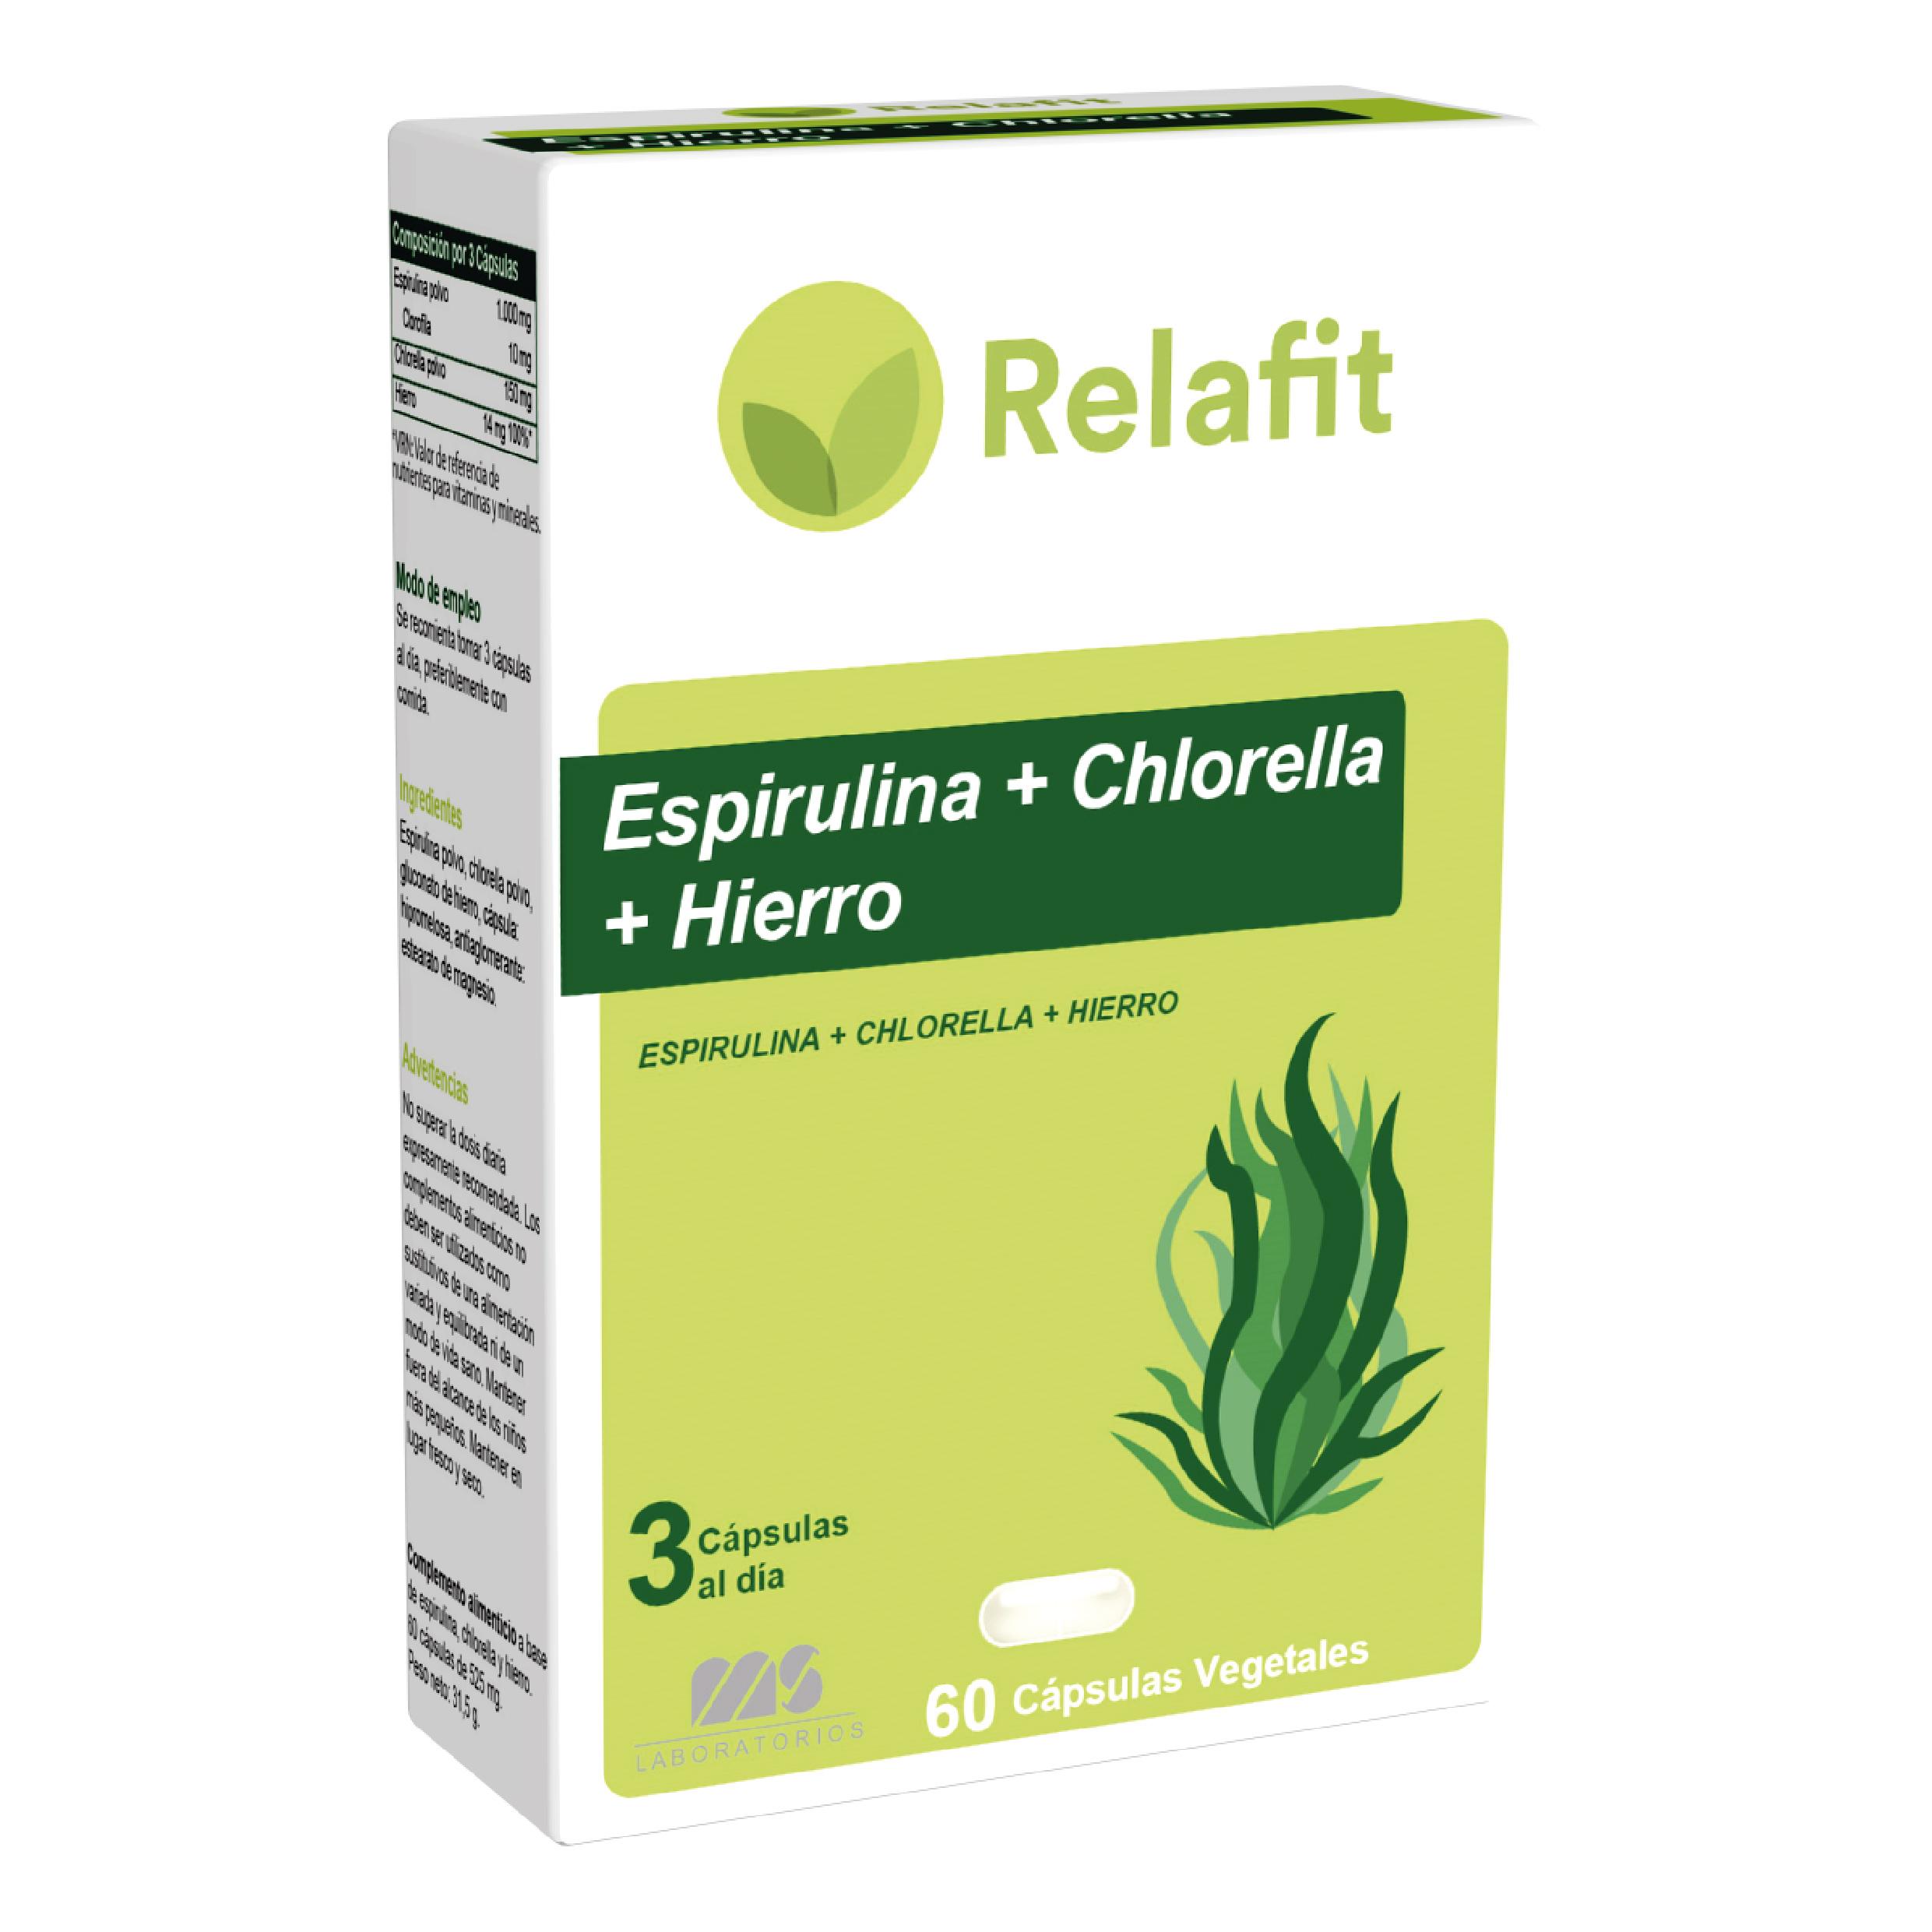 Espirulinaa + Chlorella + Hierro